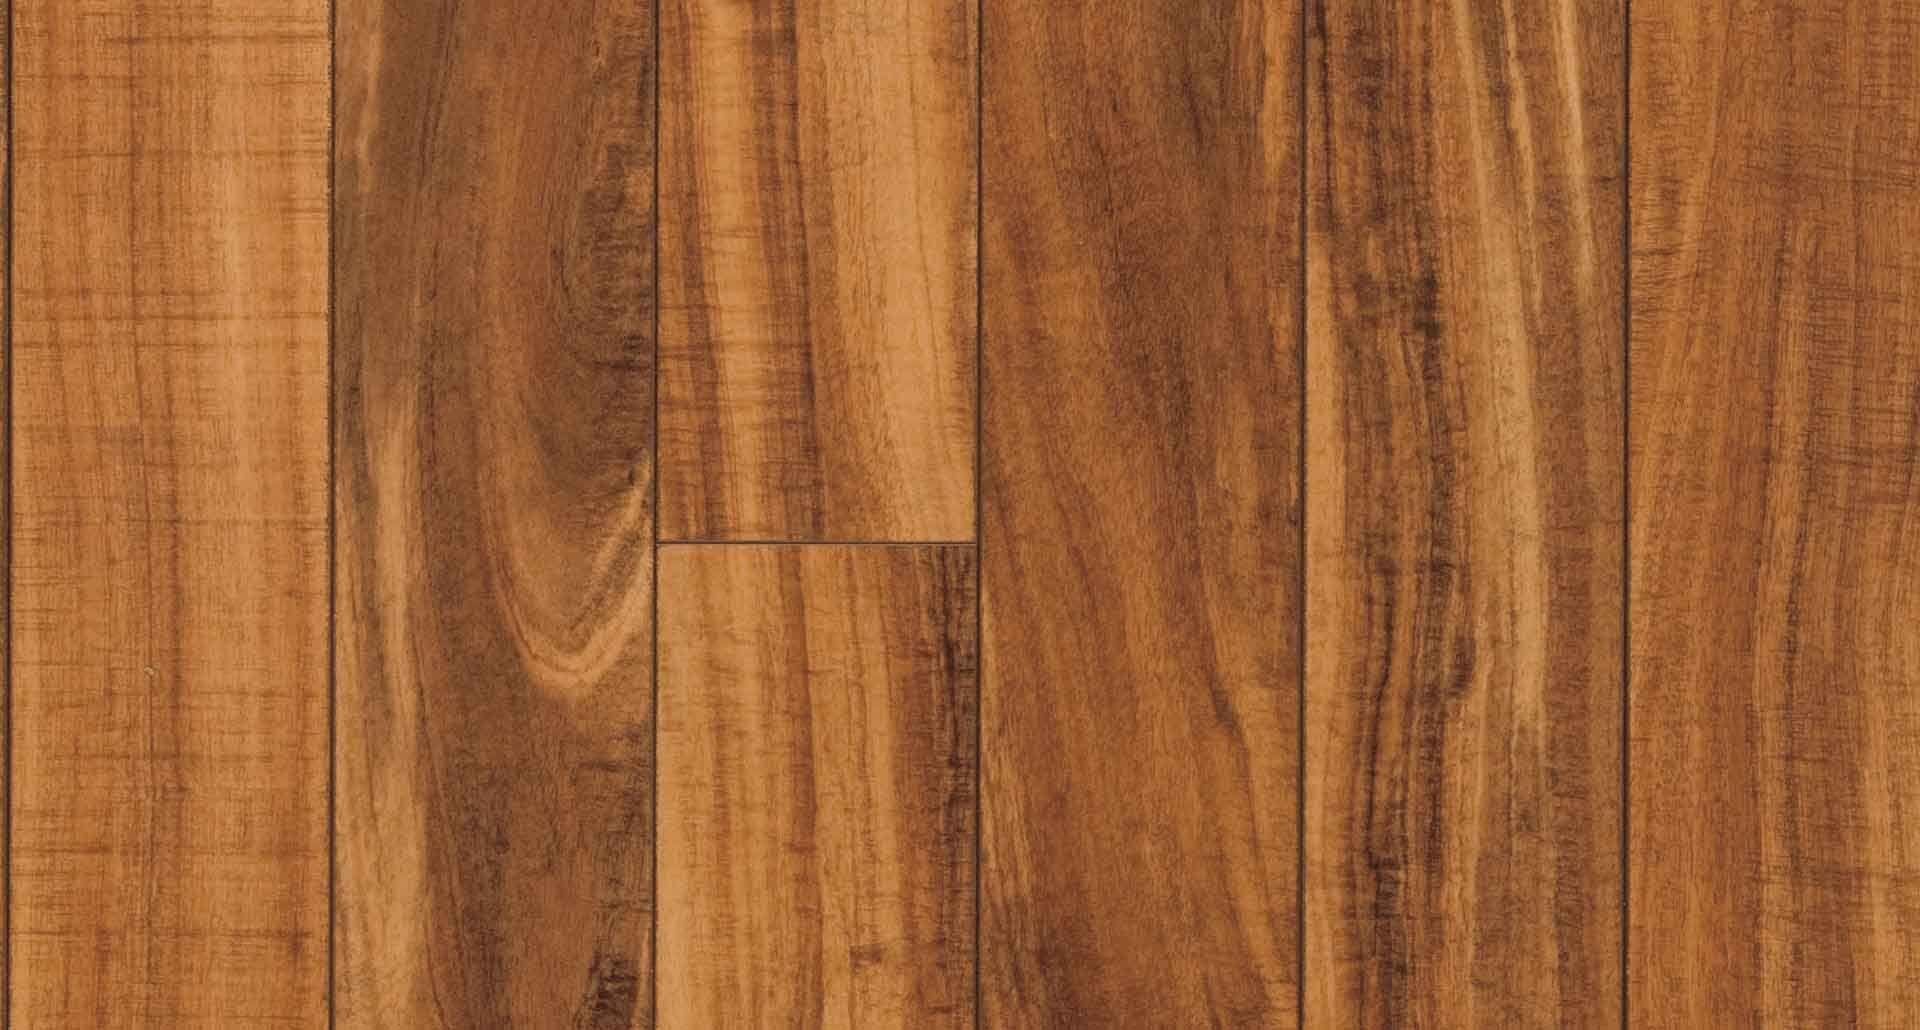 Hawaiian Curly Koa Pergo Xp Laminate Flooring Pergo Flooring Flooring Pergo Flooring Pergo Laminate